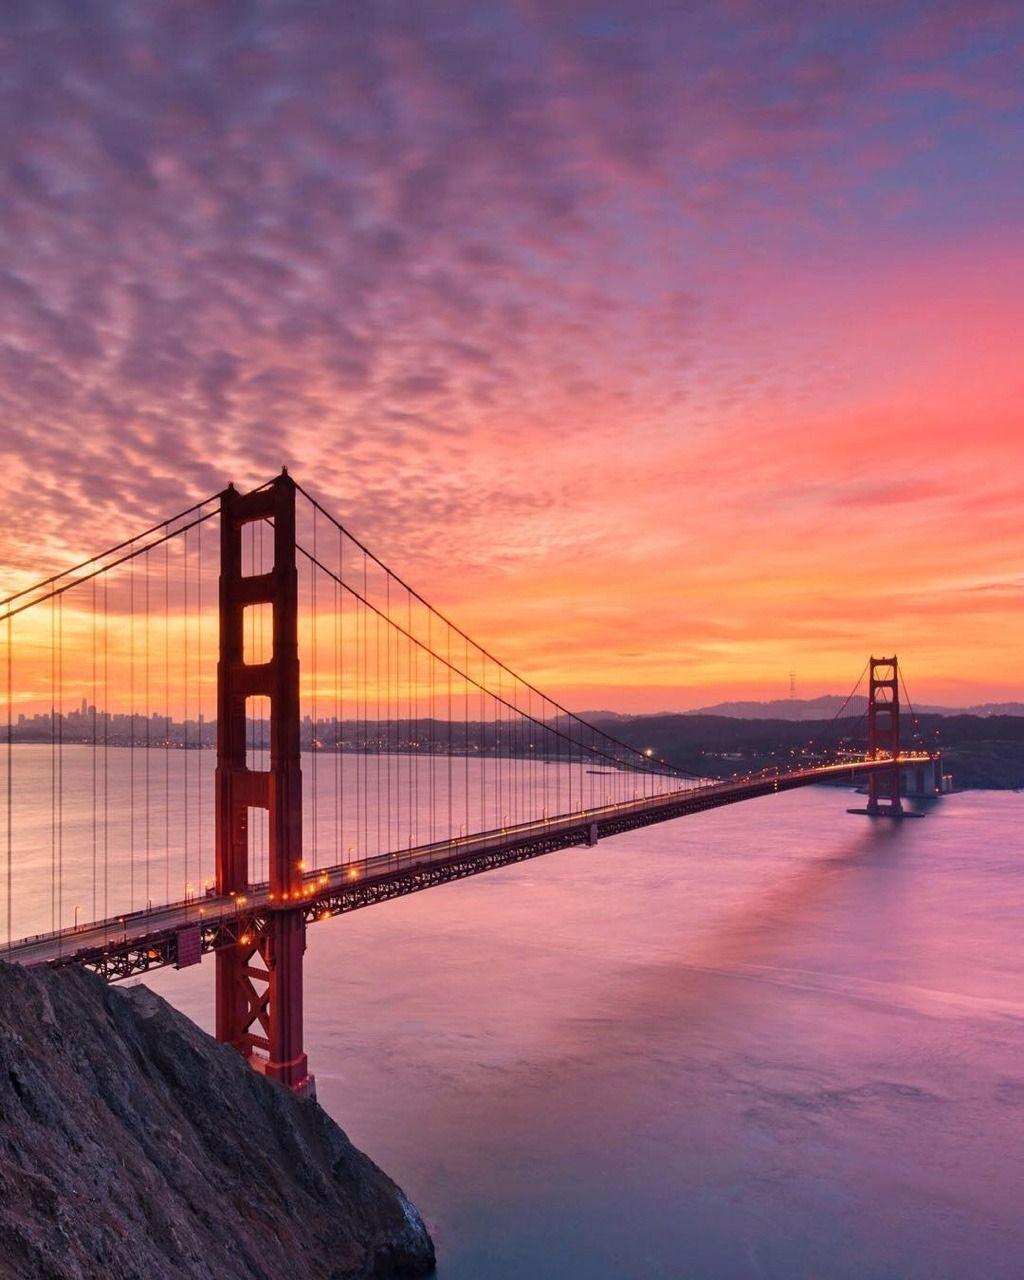 Golden Gate Bridge Golden Gate Bridge Golden Gate San Francisco Golden Gate Bridge